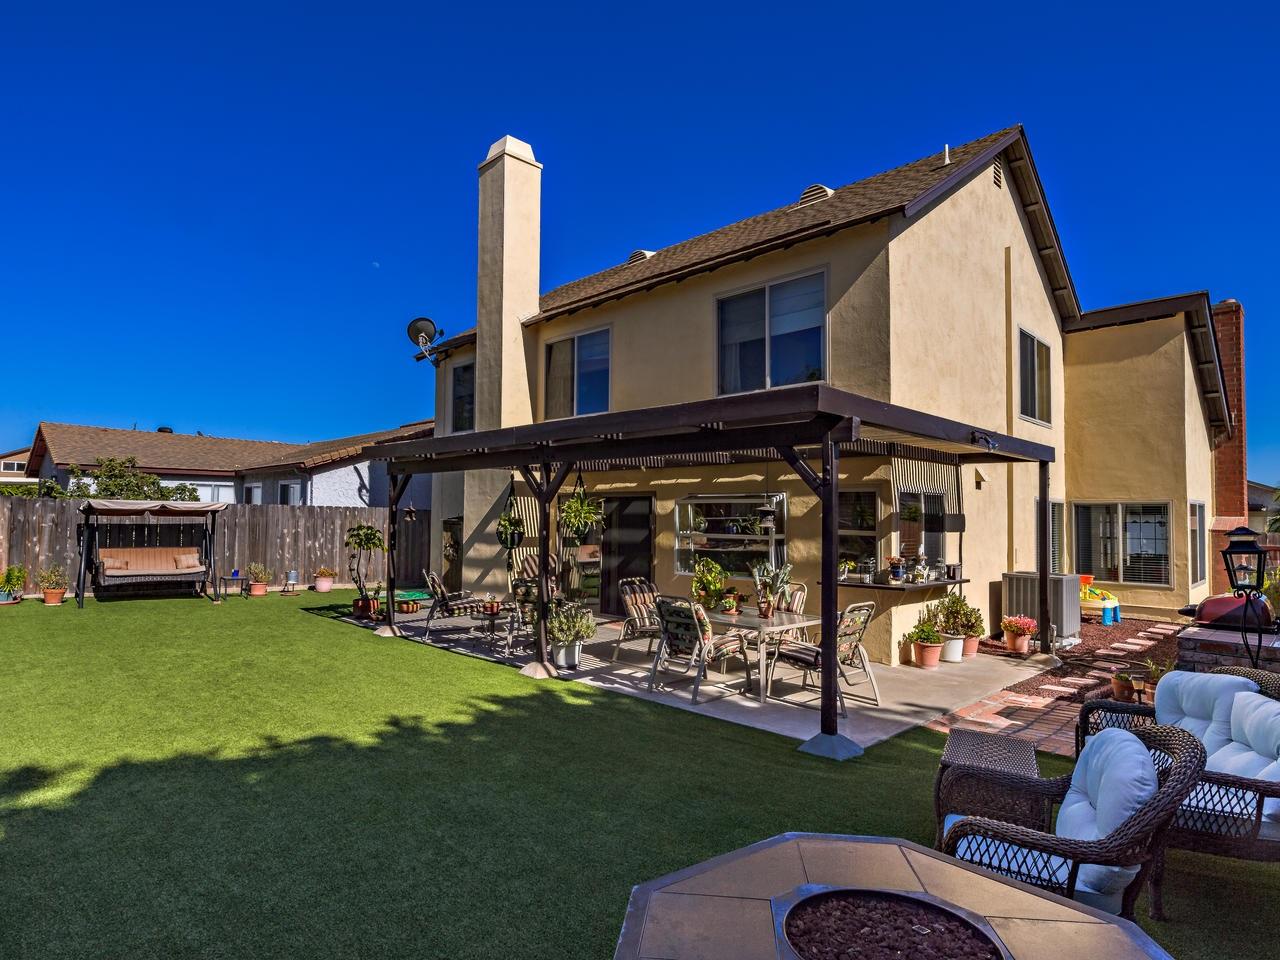 8370 Aries Rd., San Diego, CA 92126